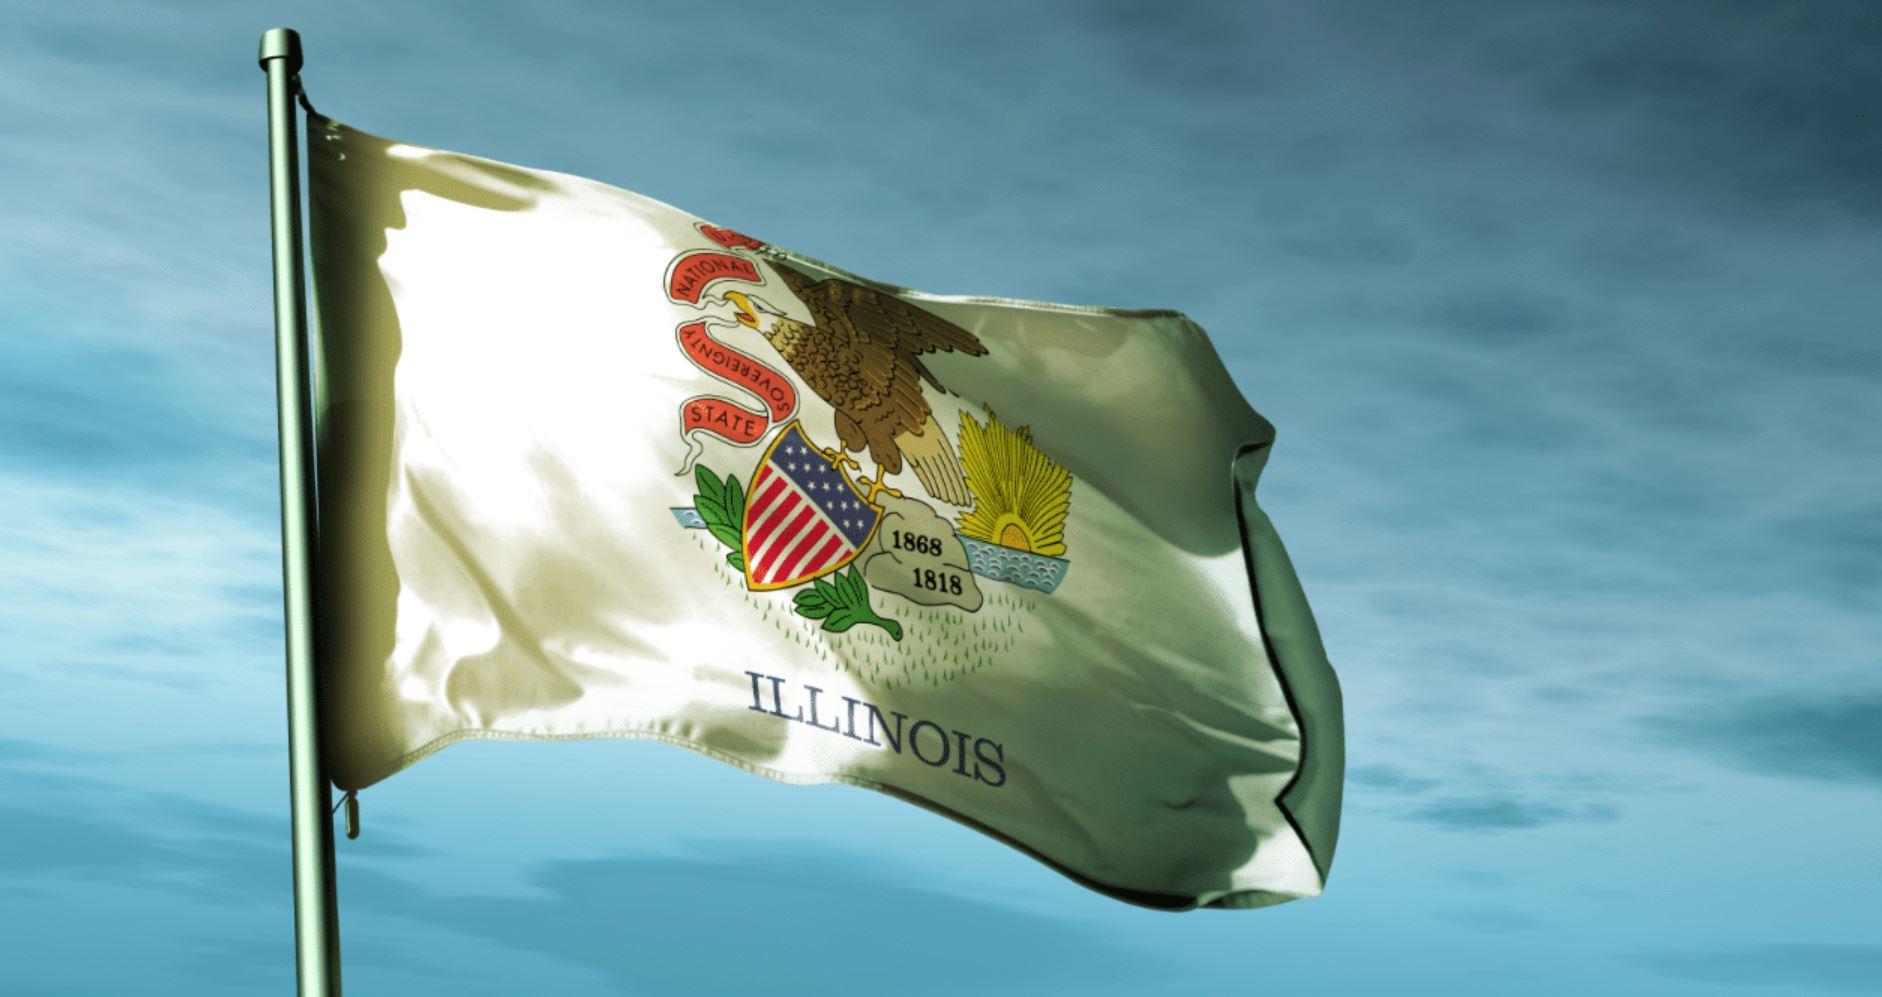 Illinois Expunges Over Half a Million Past Marijuana Convictions Despite Federal Prohibition